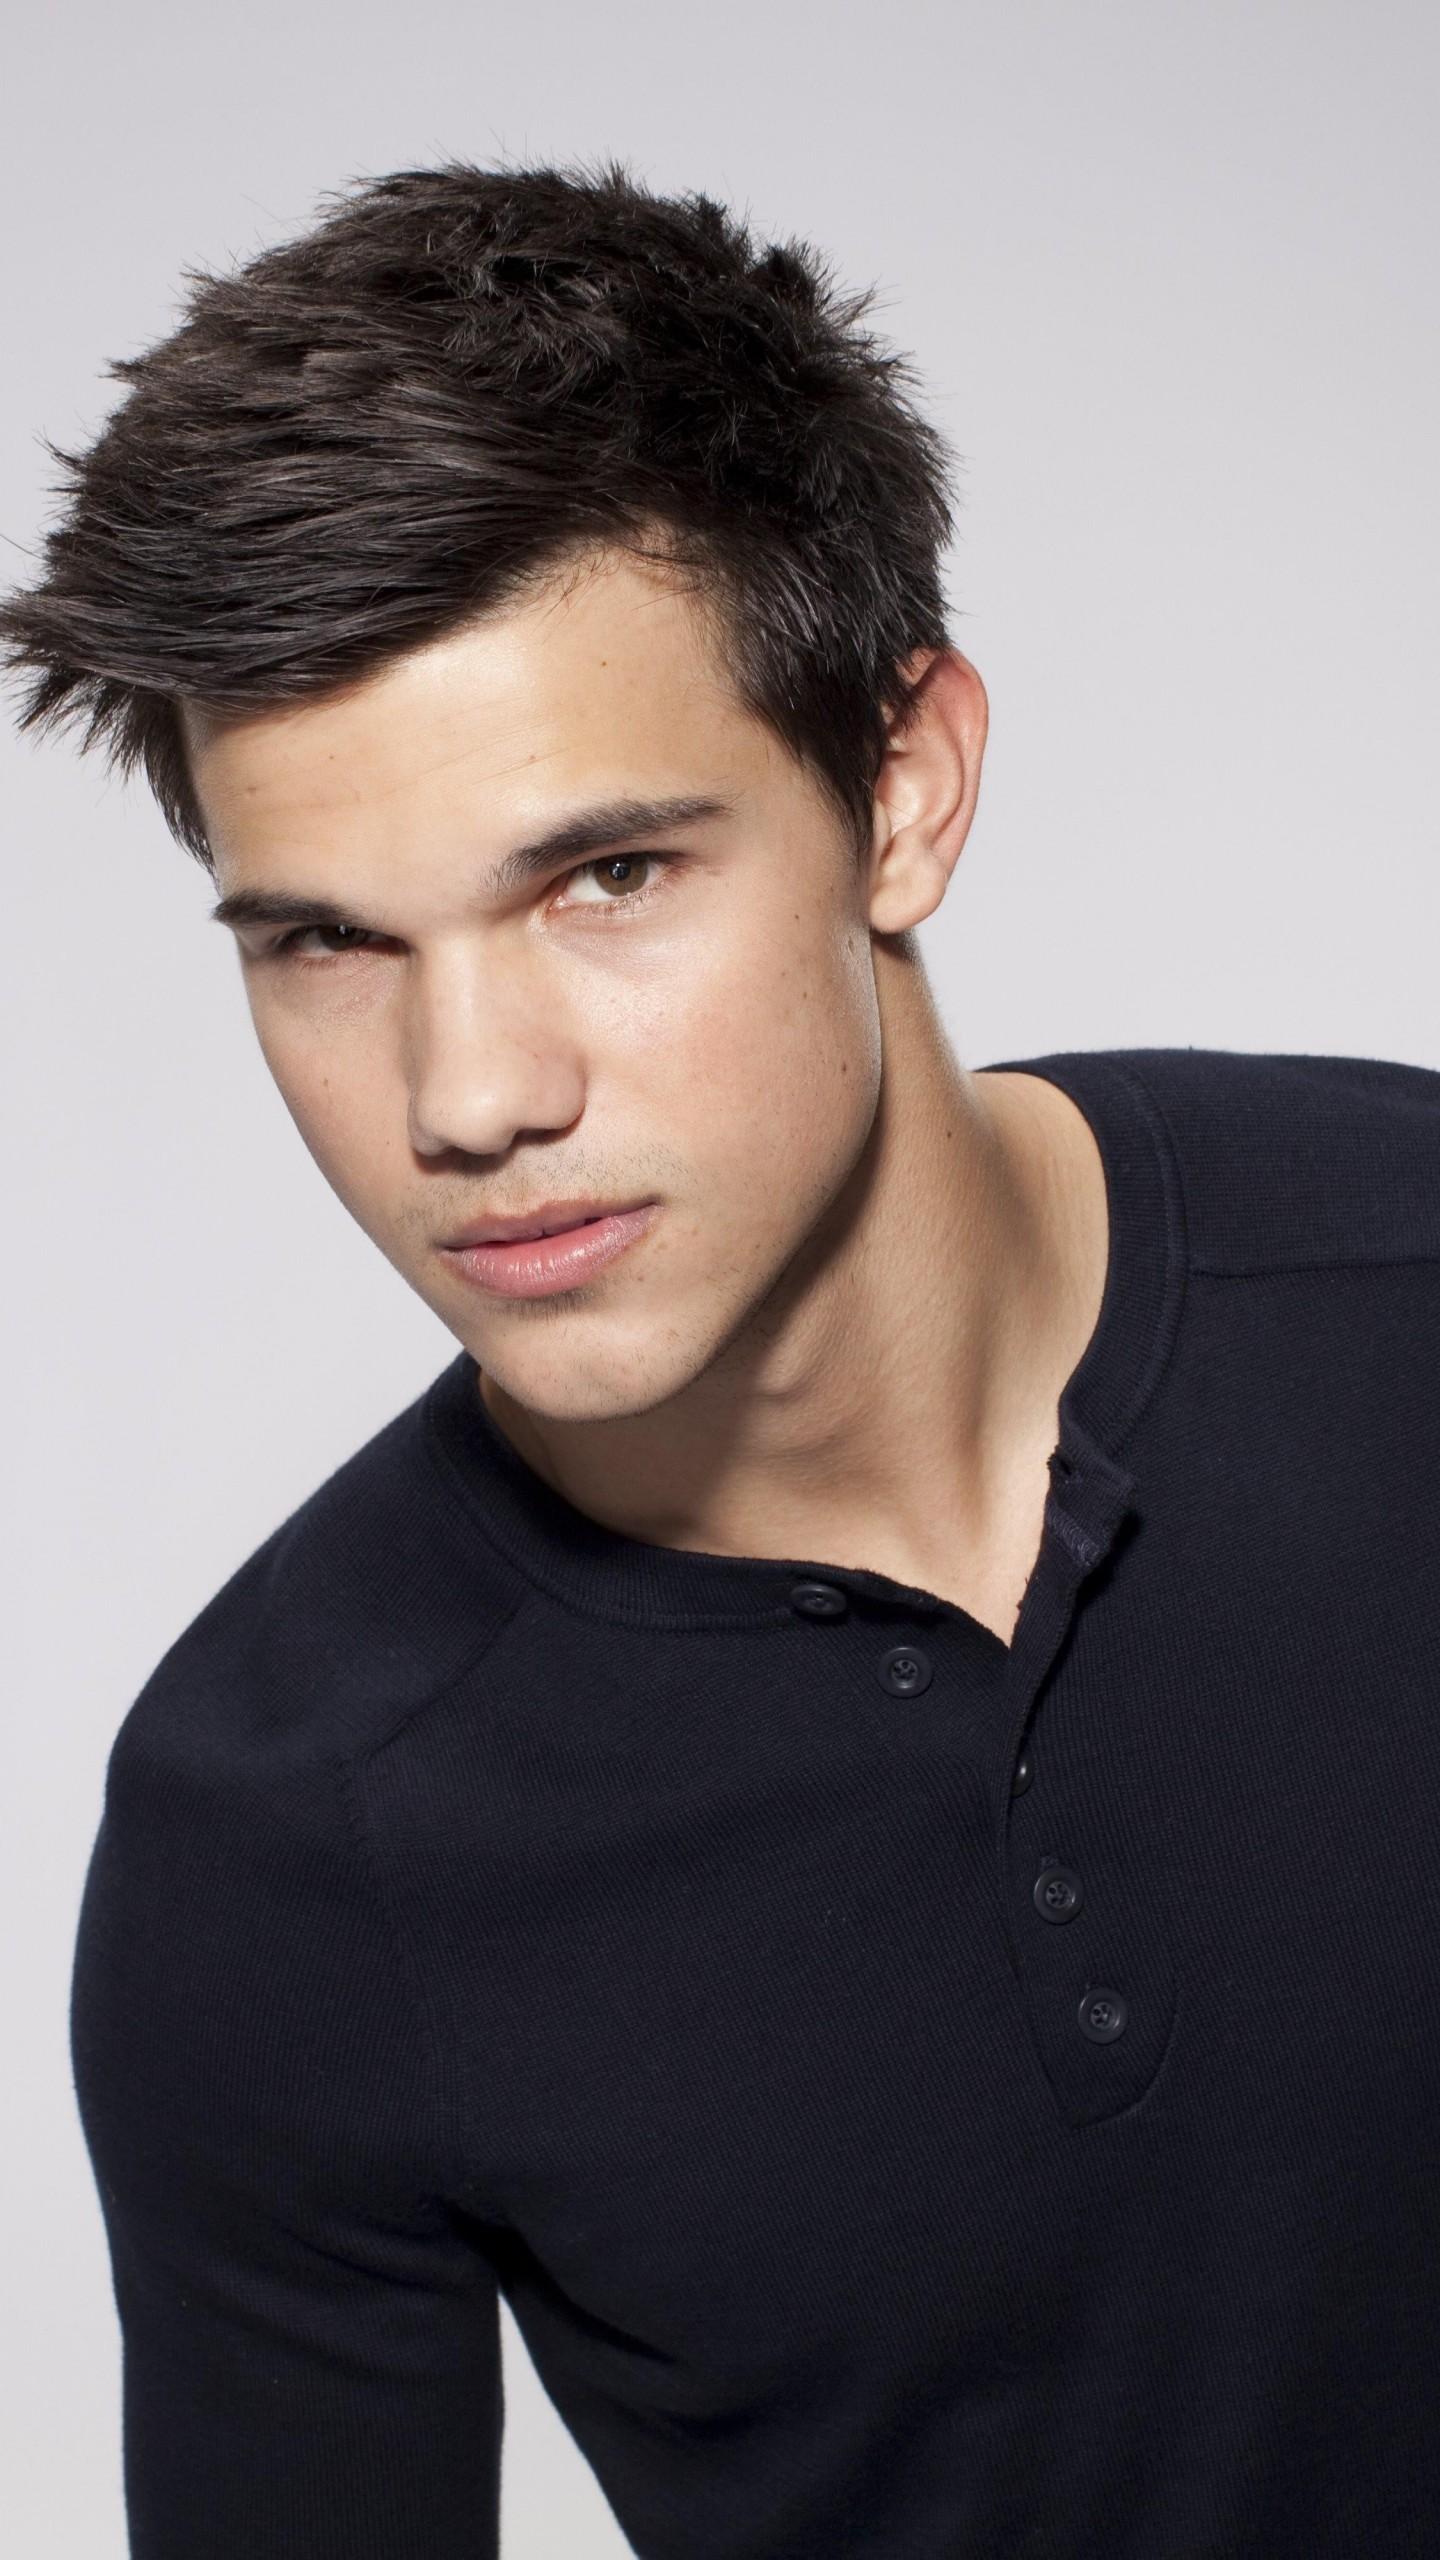 Top Male Models On Instagram: Wallpaper Taylor Lautner, Top Fashion Male Models, Most